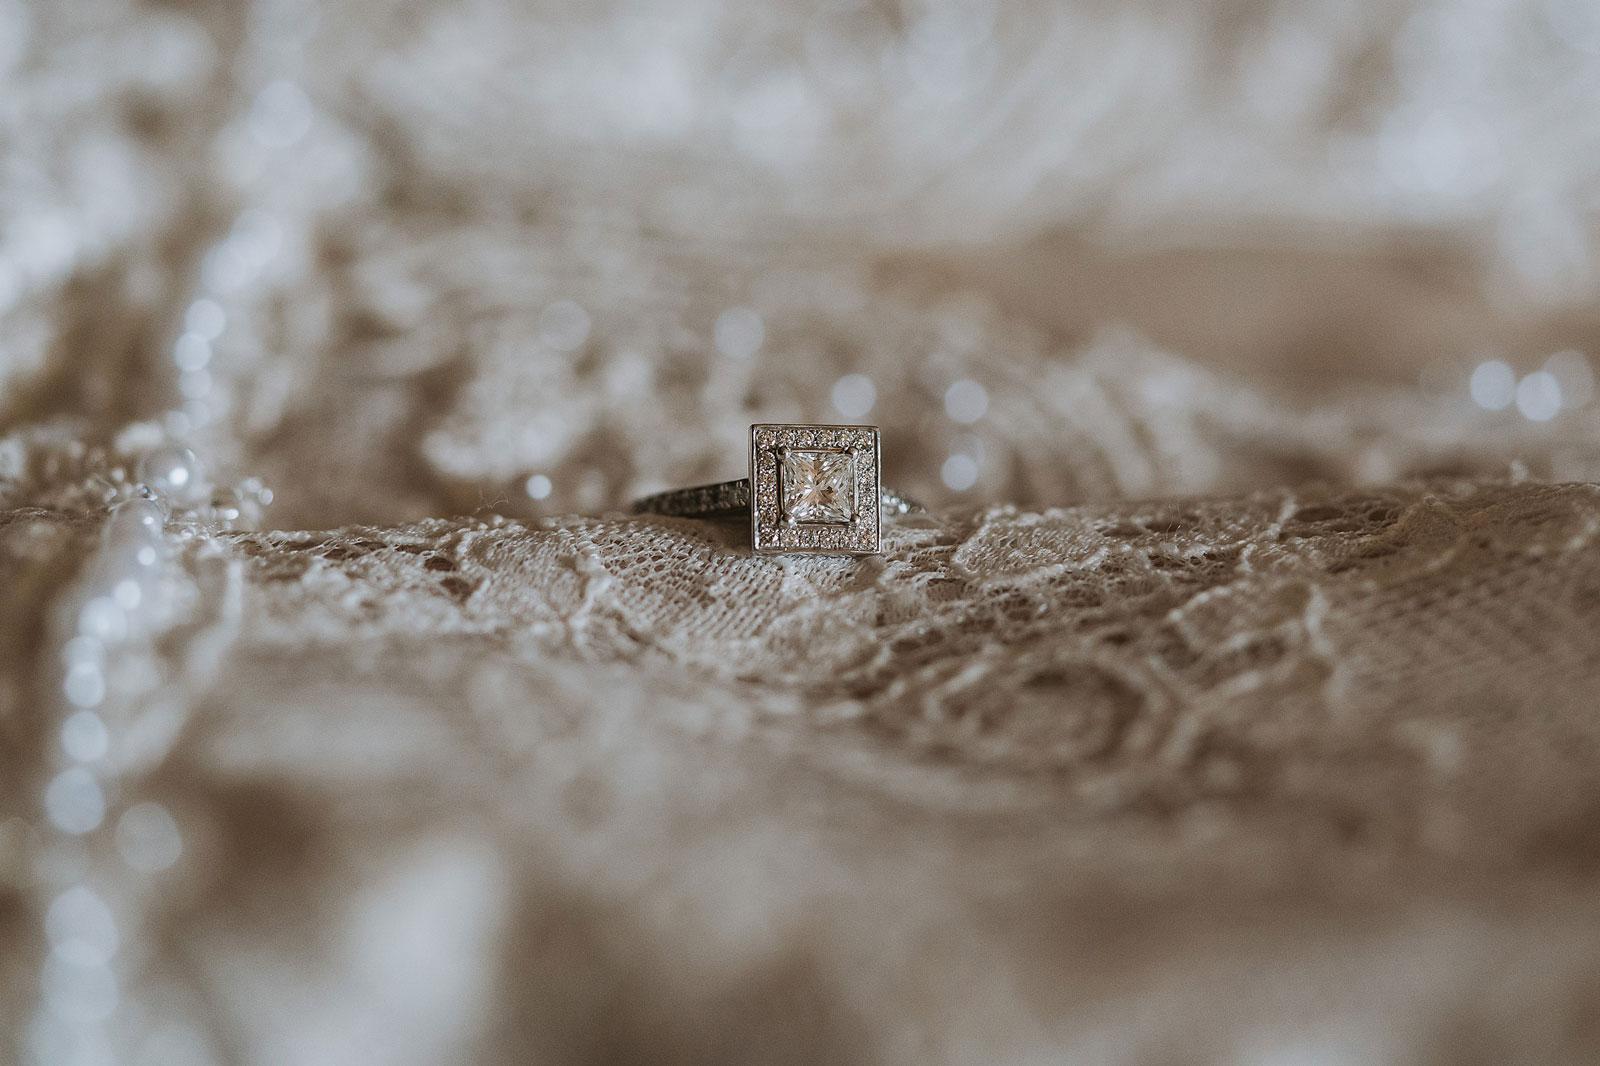 newfound-j-j-bali-nusa-dua-wedding-wedding-photographer-010-a